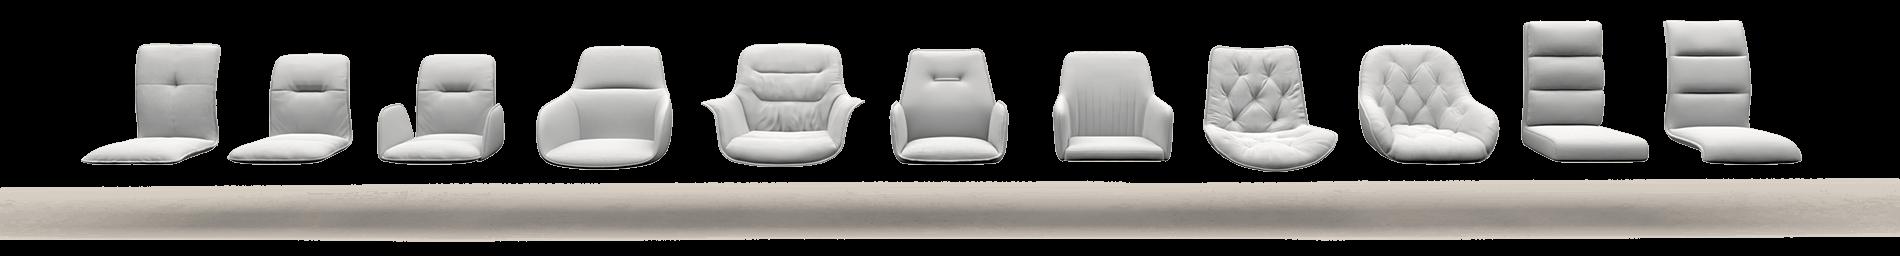 Stuhlsystem Sitzschale Teaser